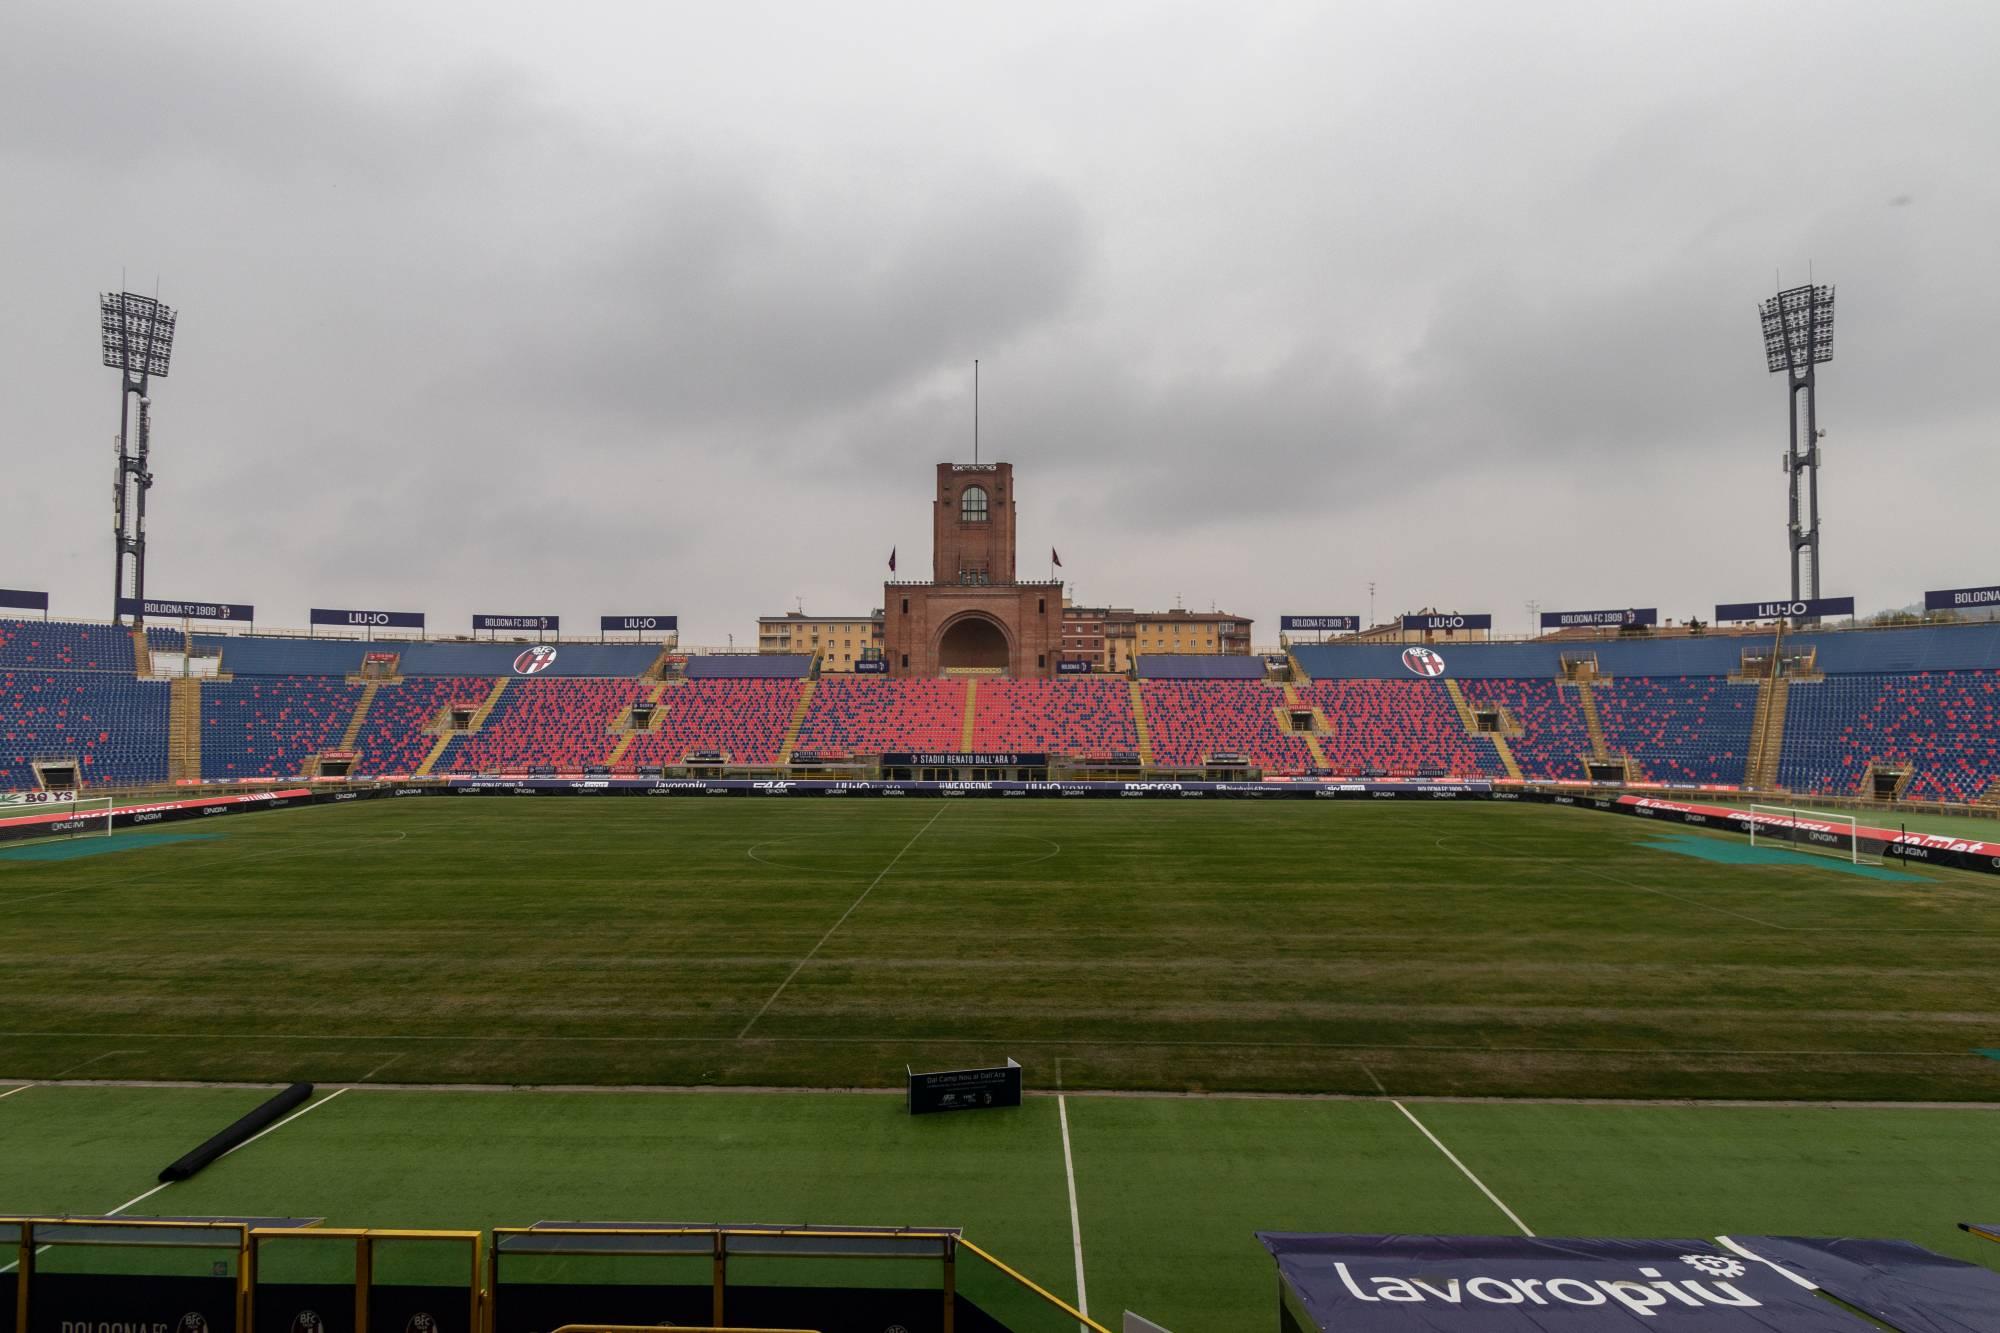 Картинки по запросу renato dall'ara stadium